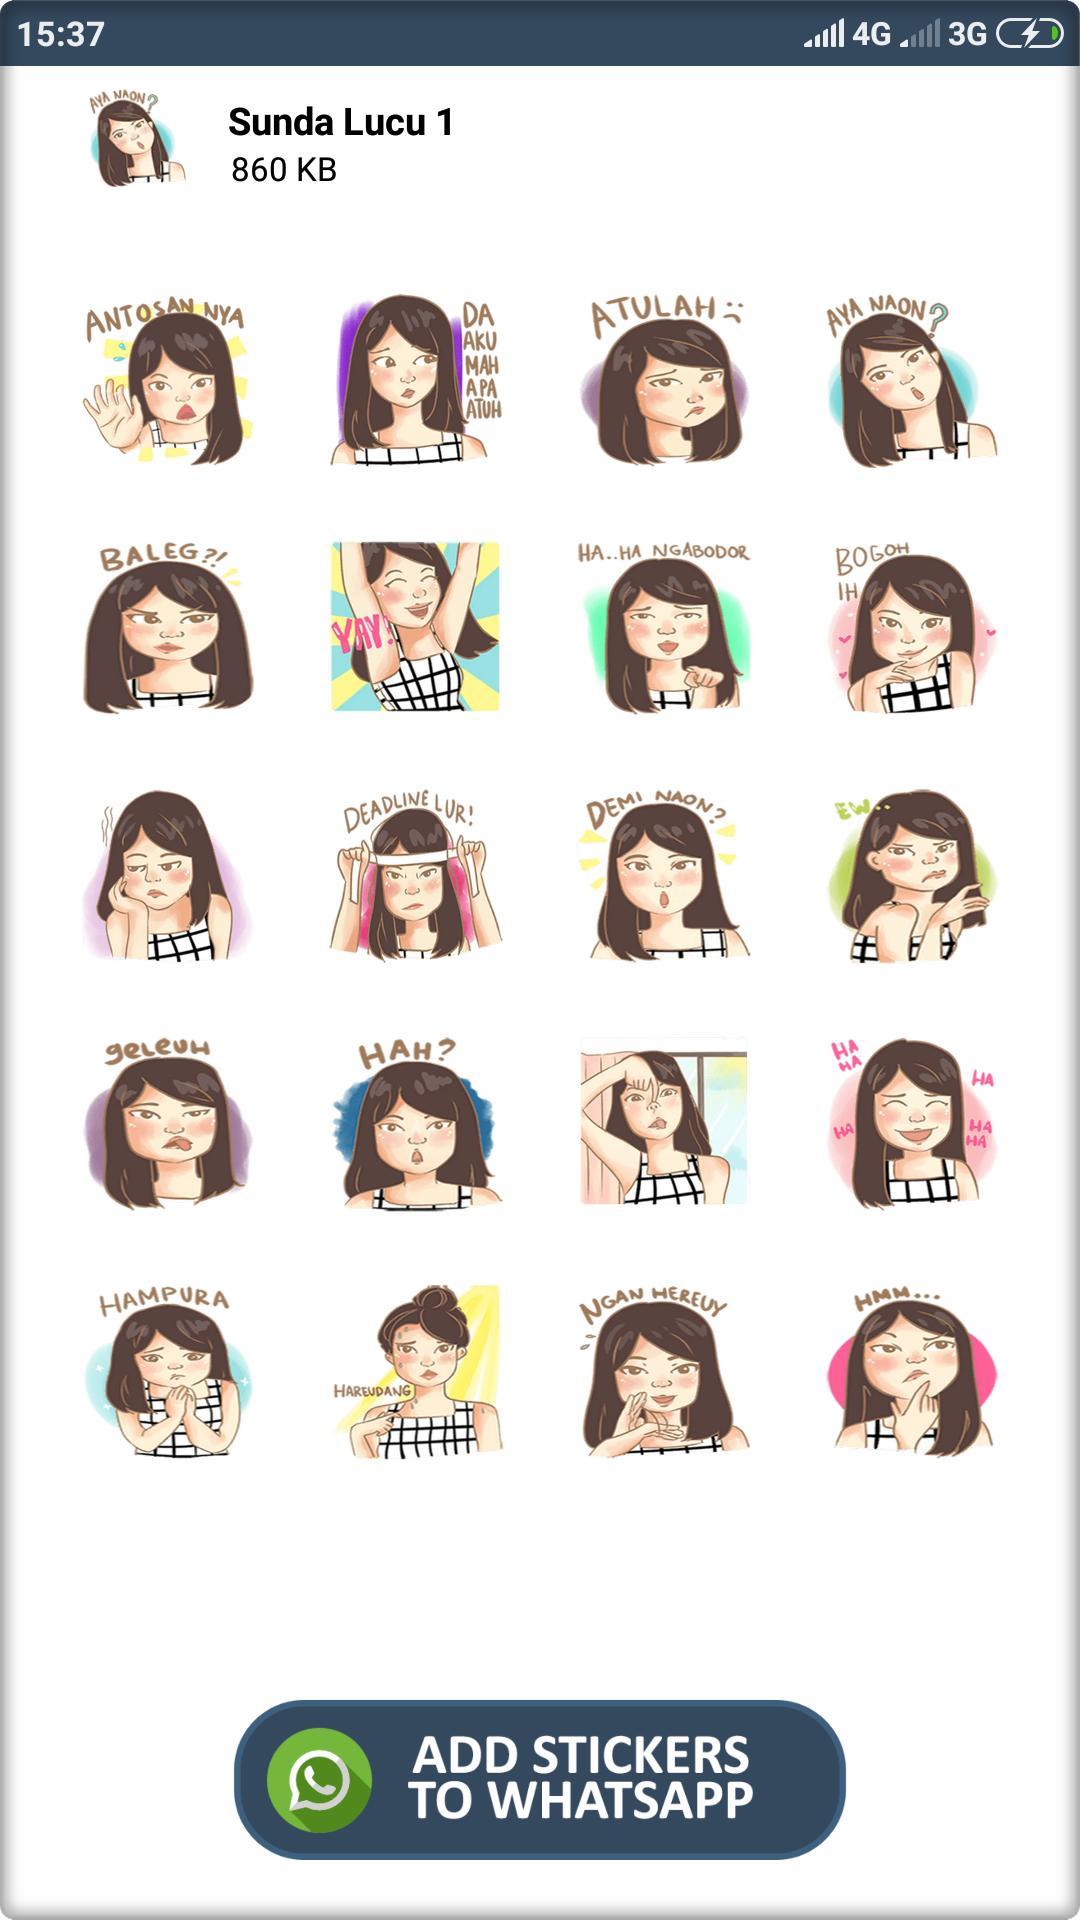 Stiker Sunda Lucu Wastickerapps For Android Apk Download